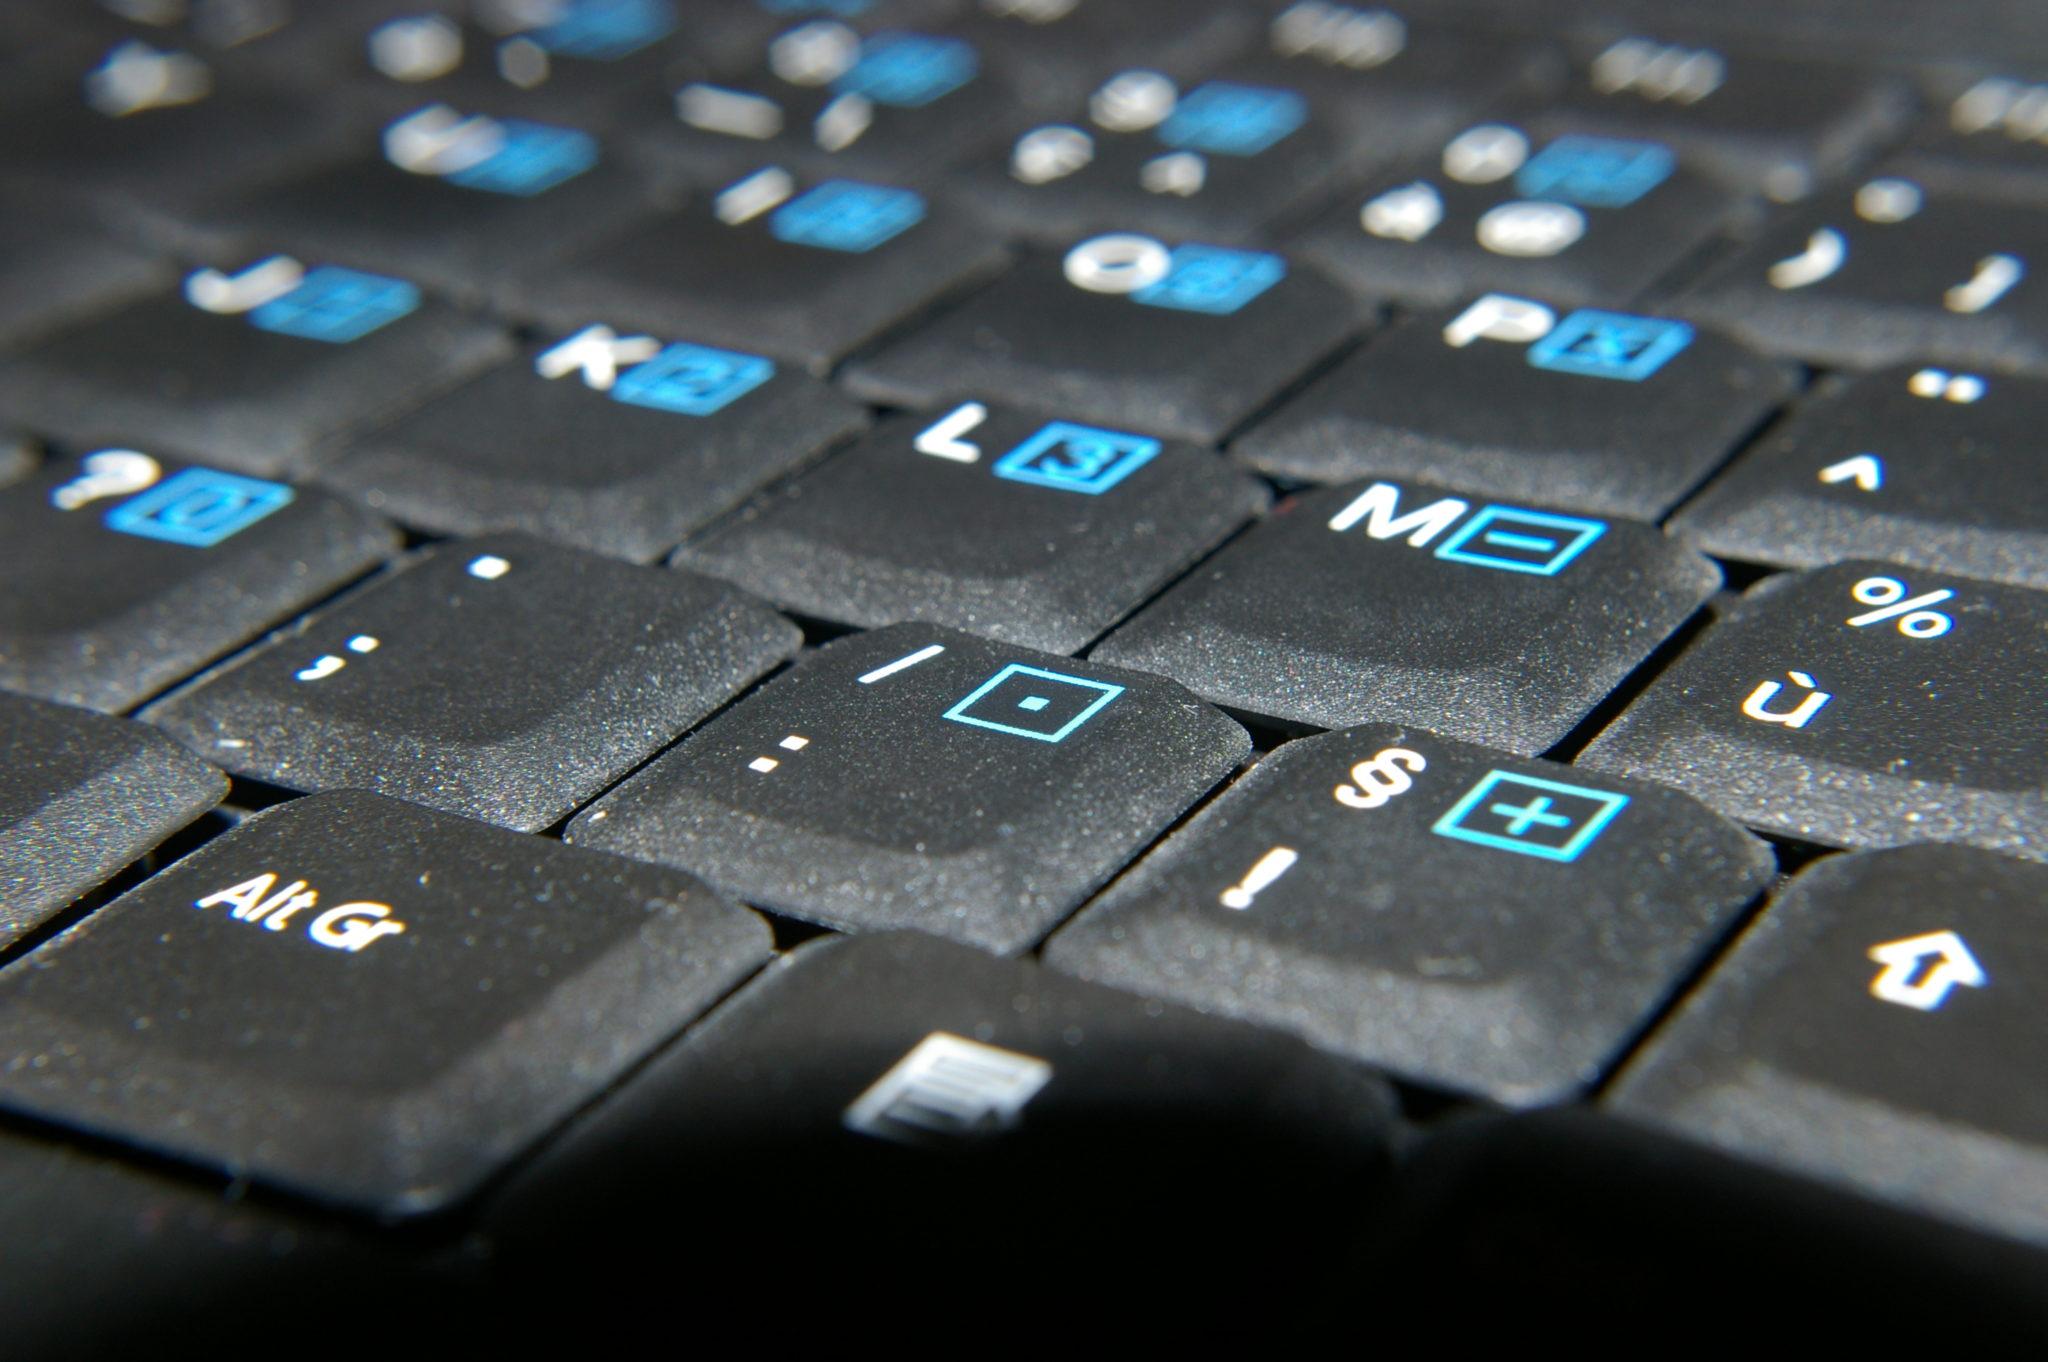 stockvault-black-keyboard104799